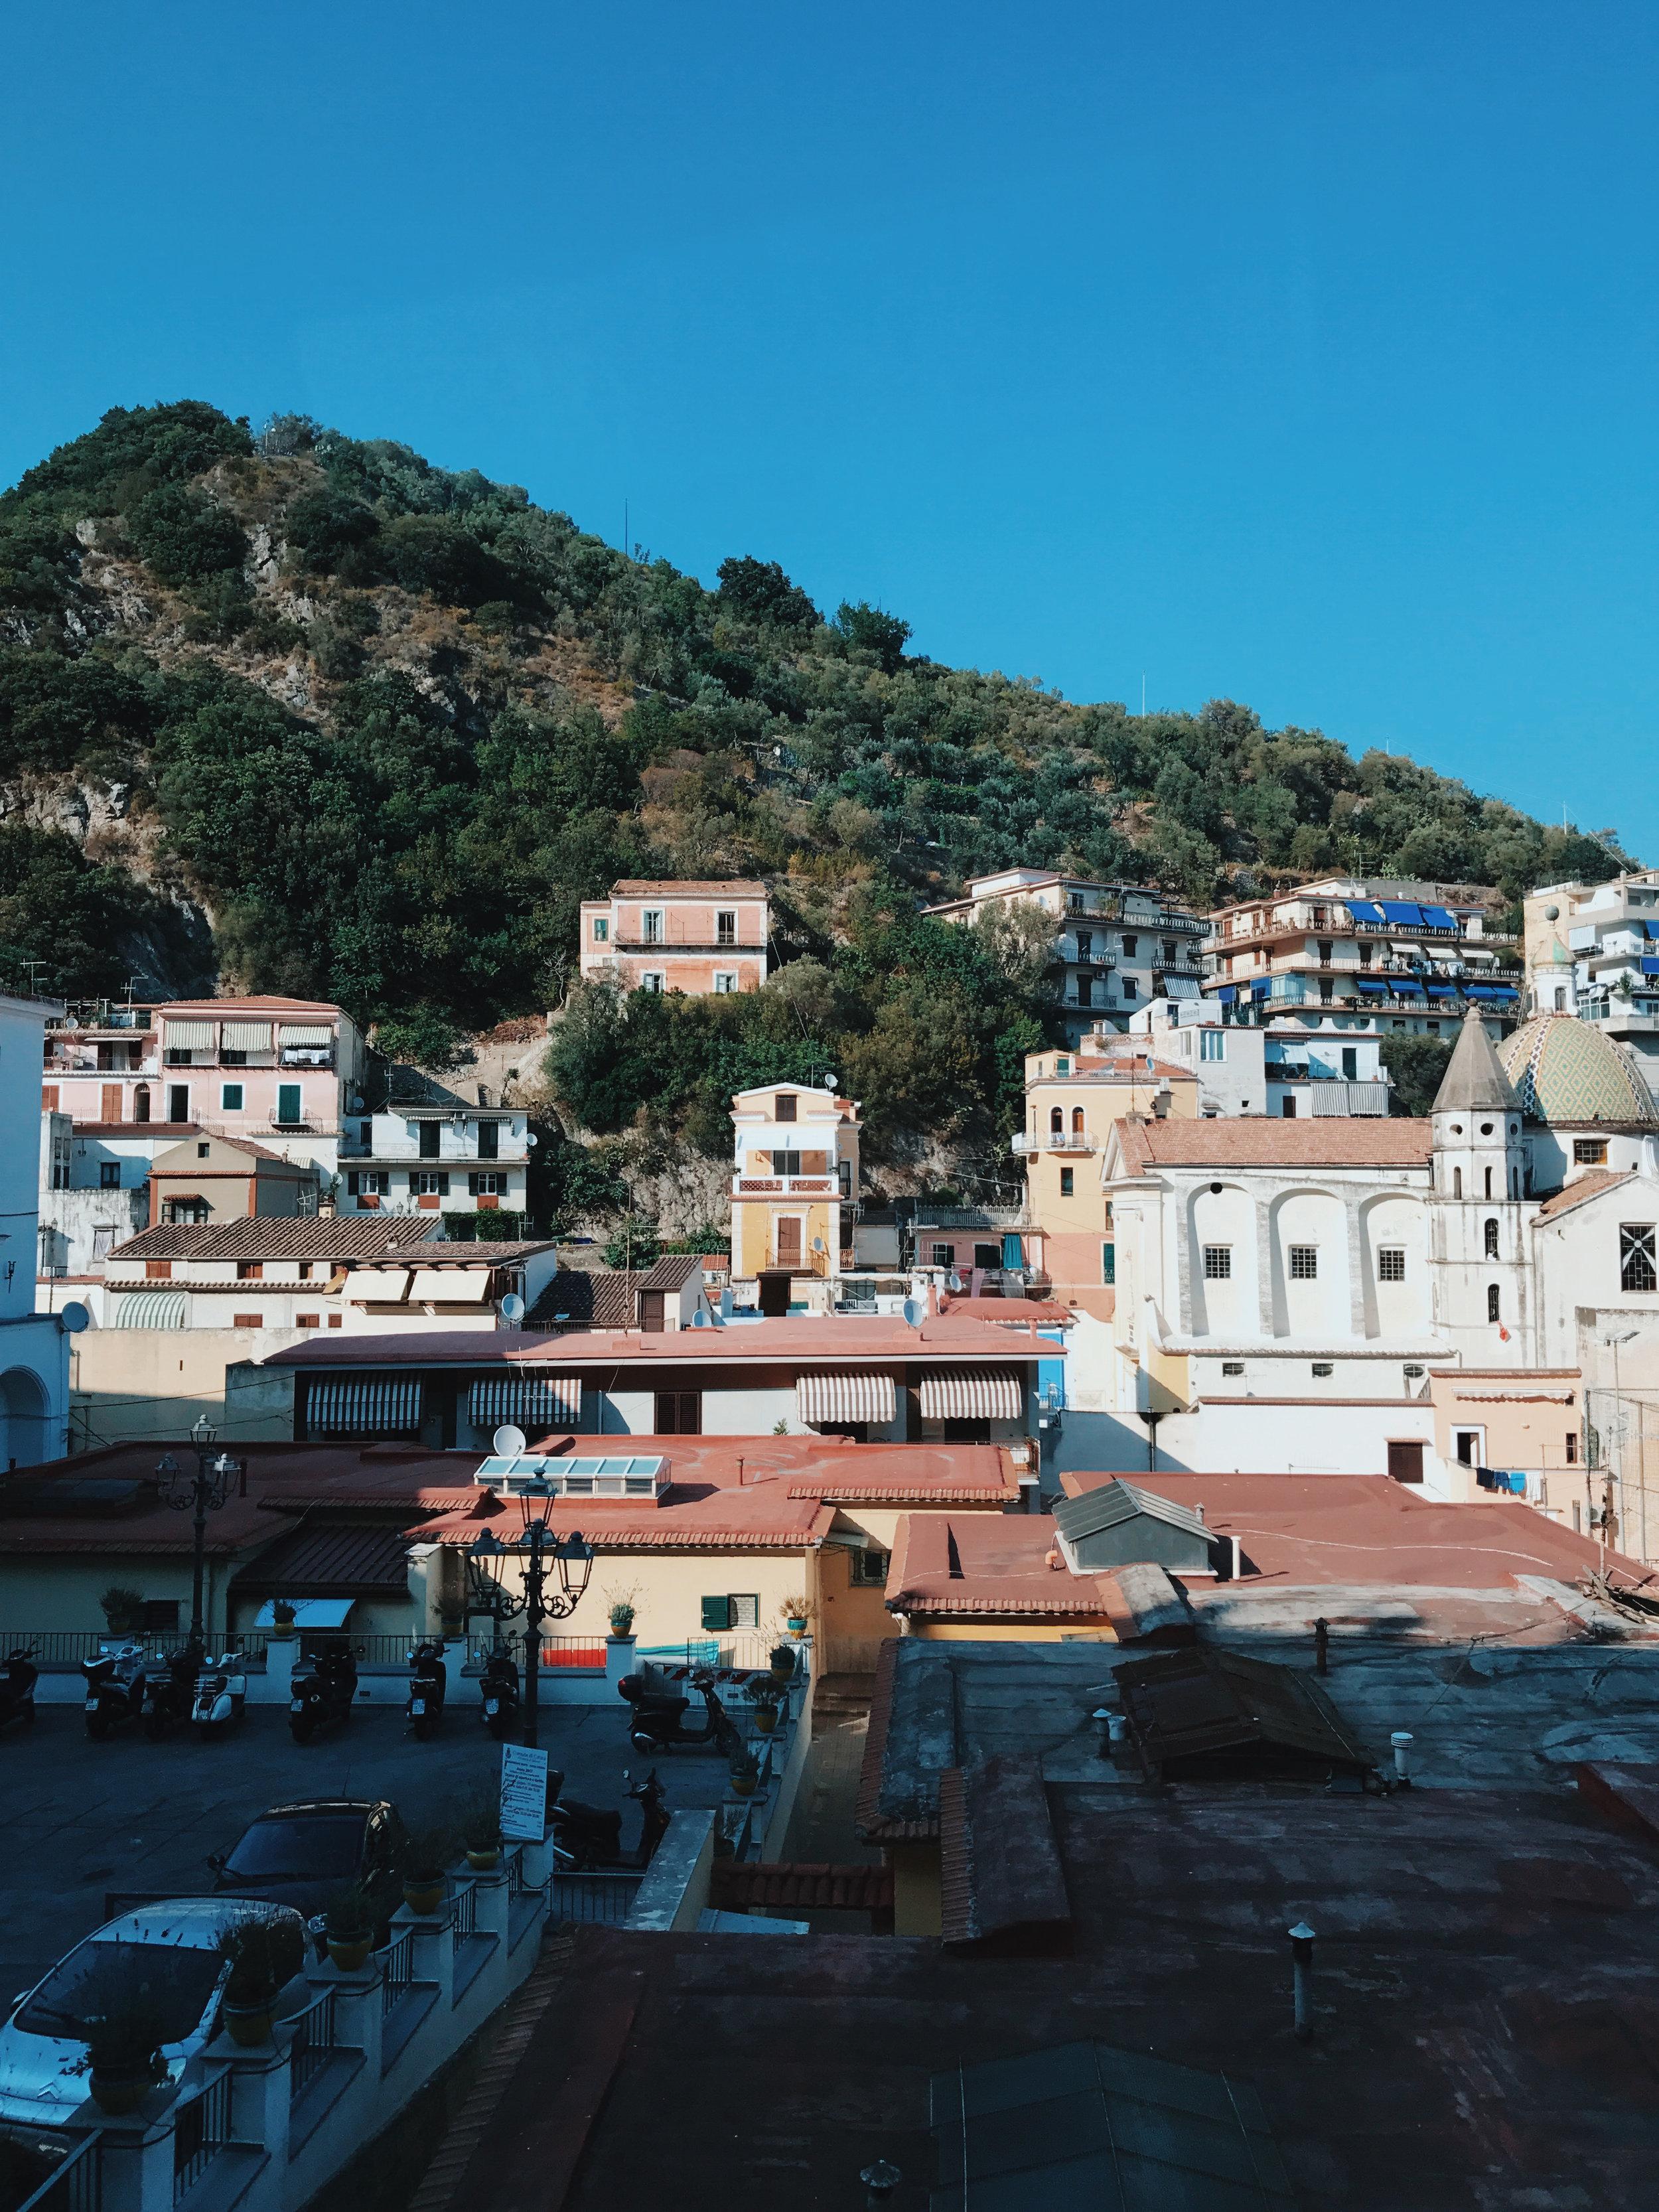 Italy-Amalfi-5.jpg